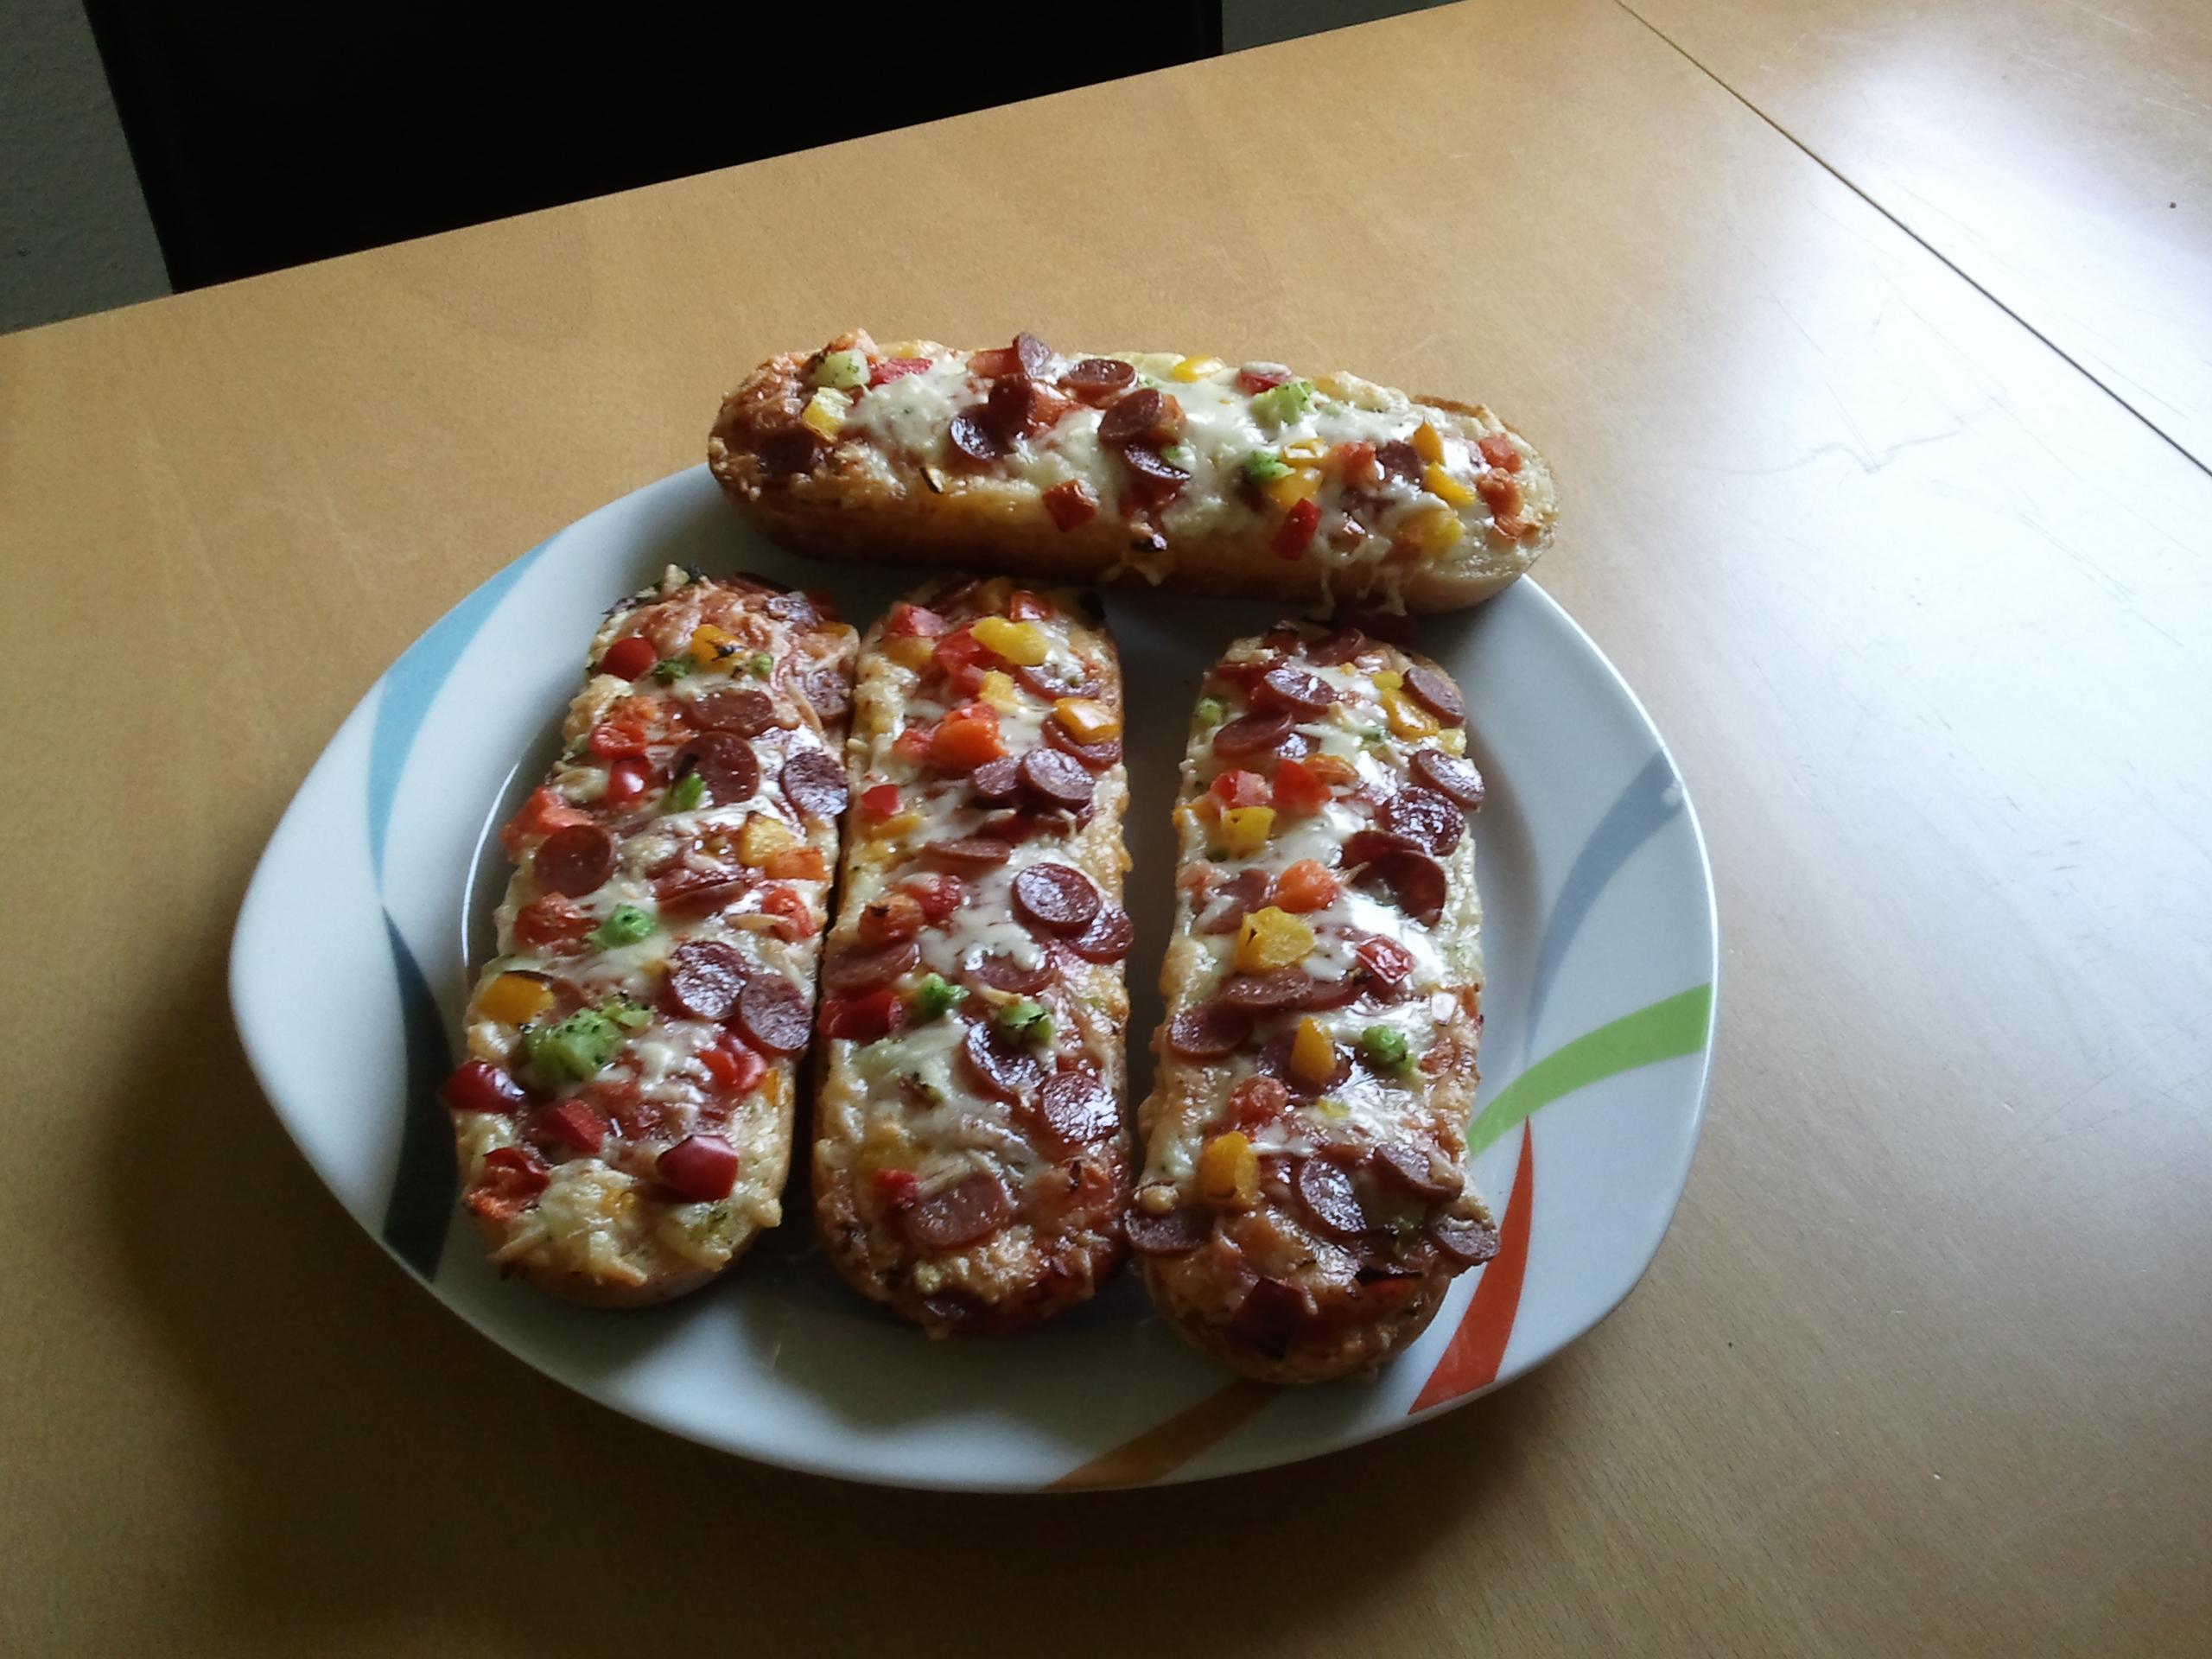 http://foodloader.net/Timber_2013-05-01_Baguette.jpg